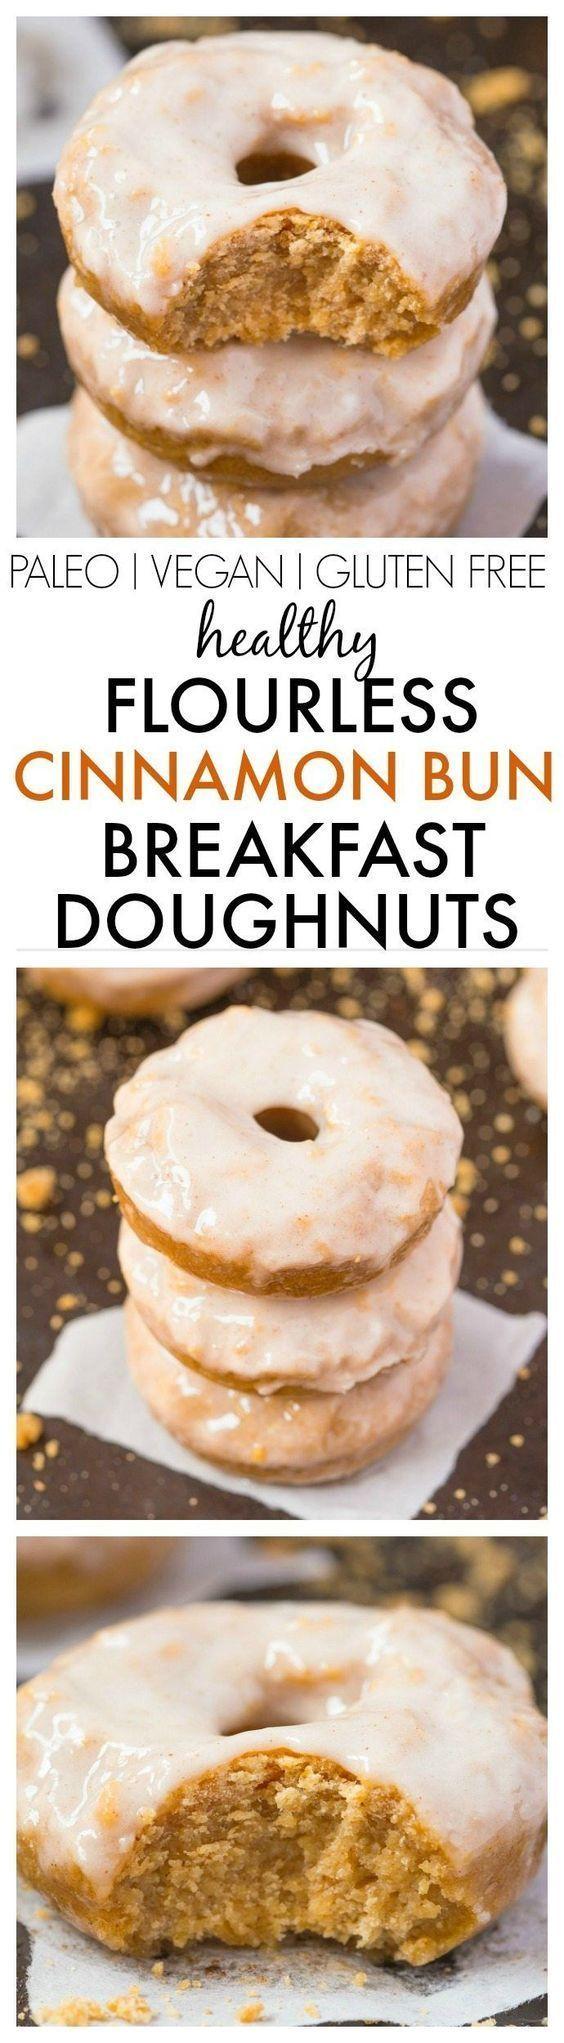 Healthy Flourless Cinnamon Bun Breakfast Doughnuts- Fluffy and satisfying!